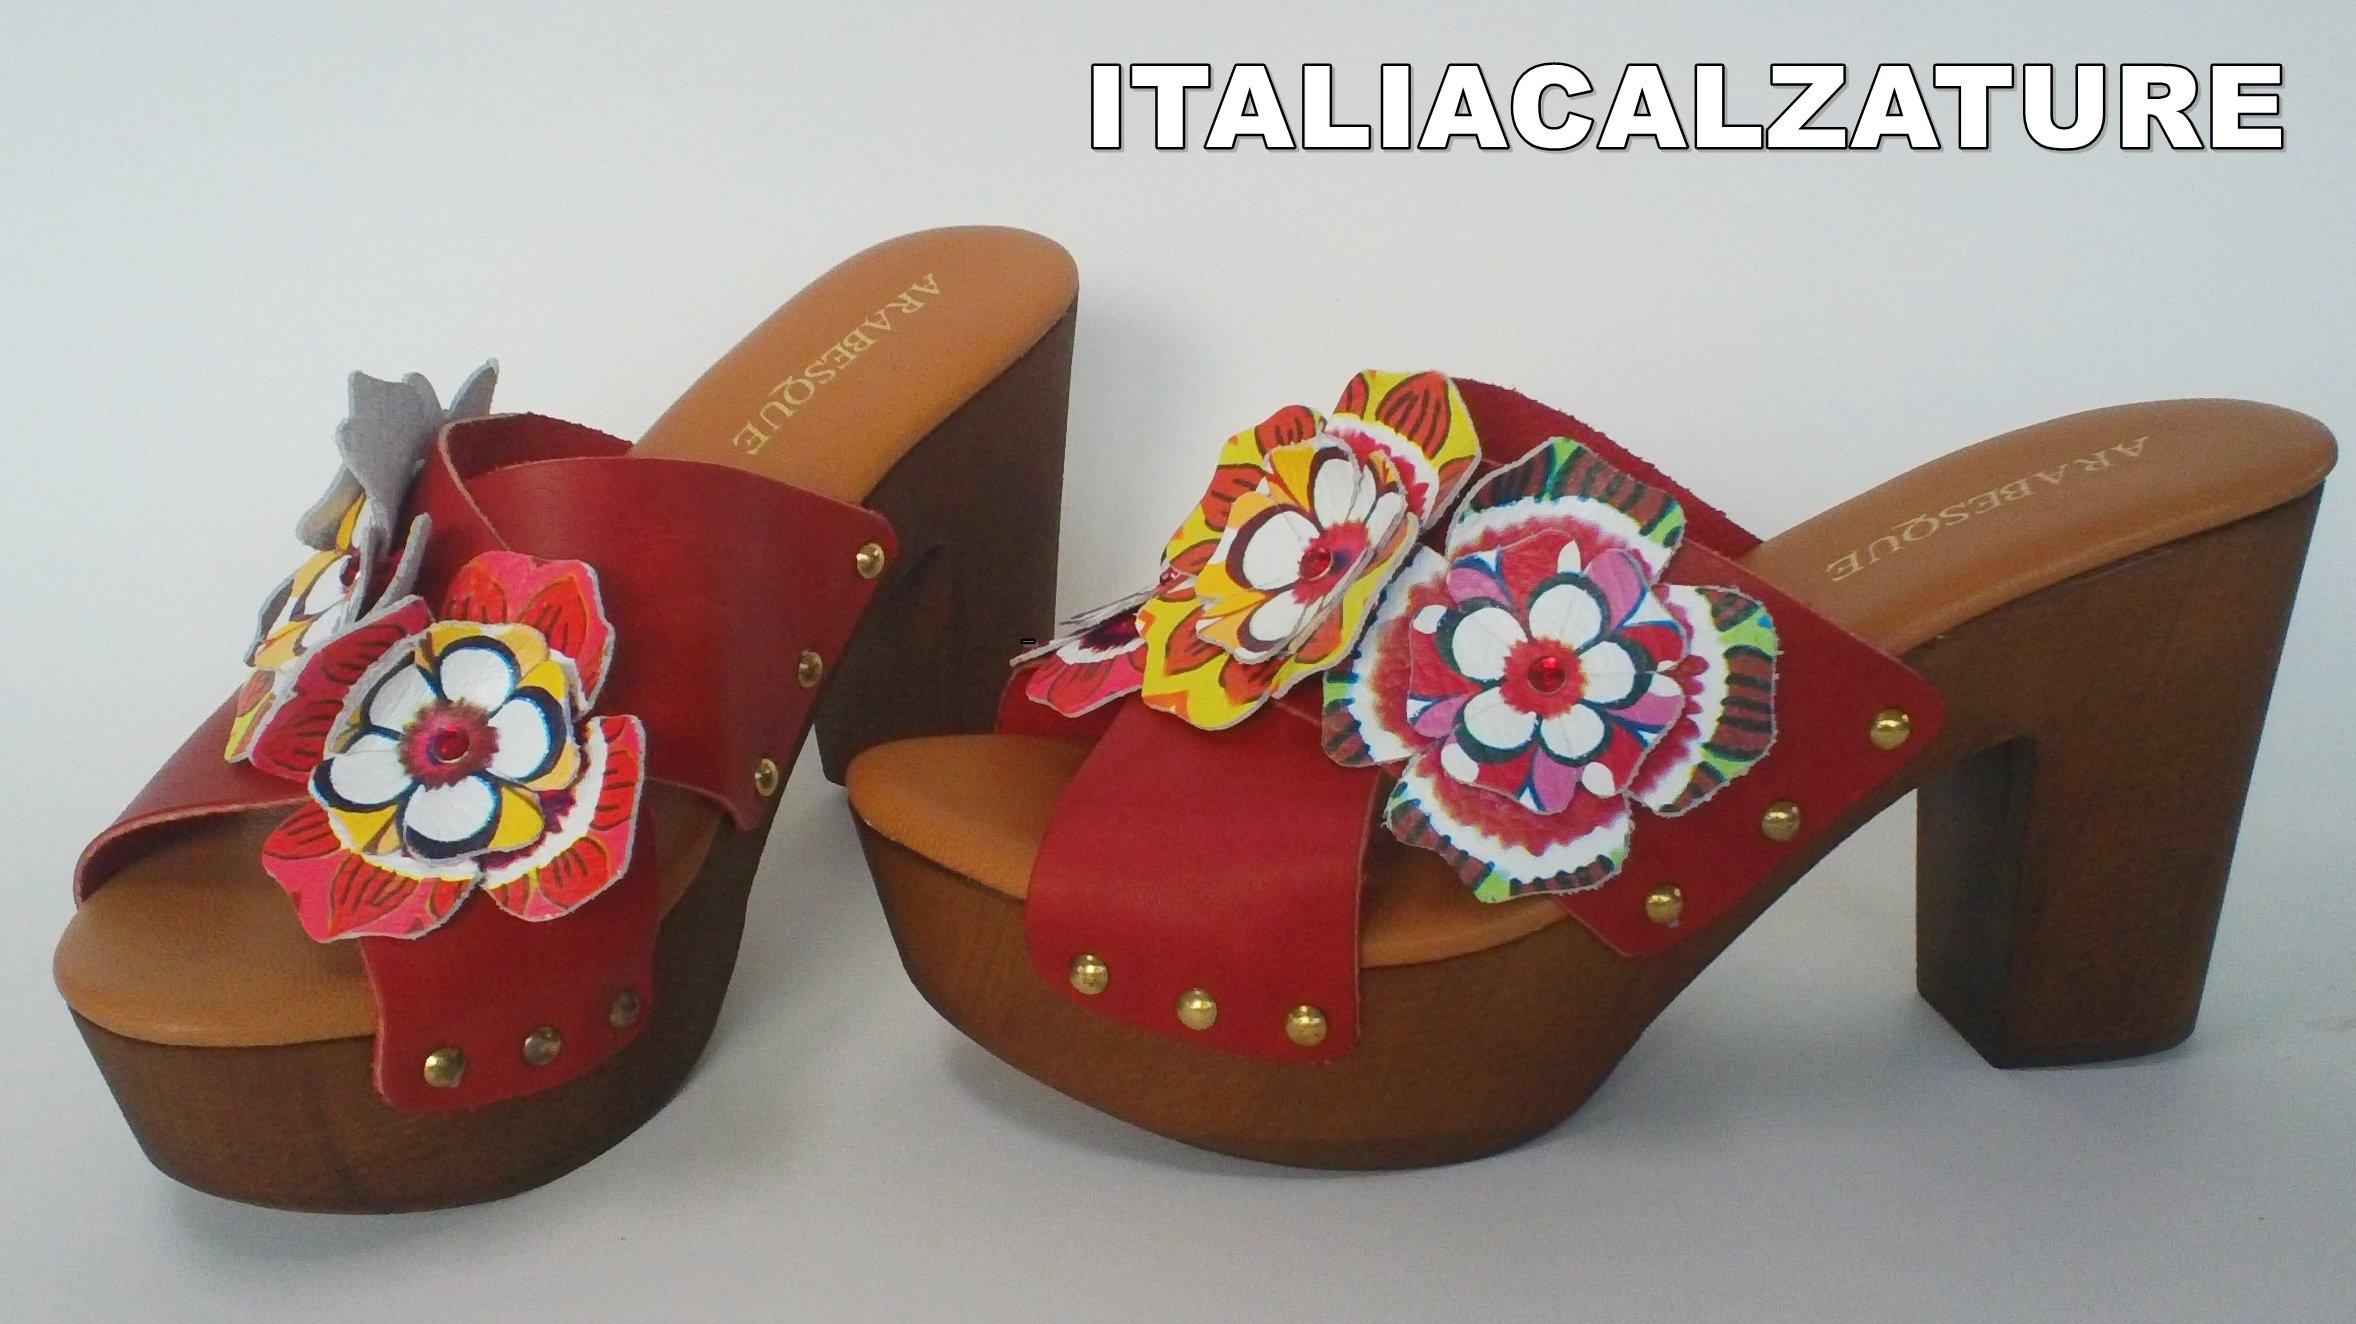 zoccoli Italiacalzature